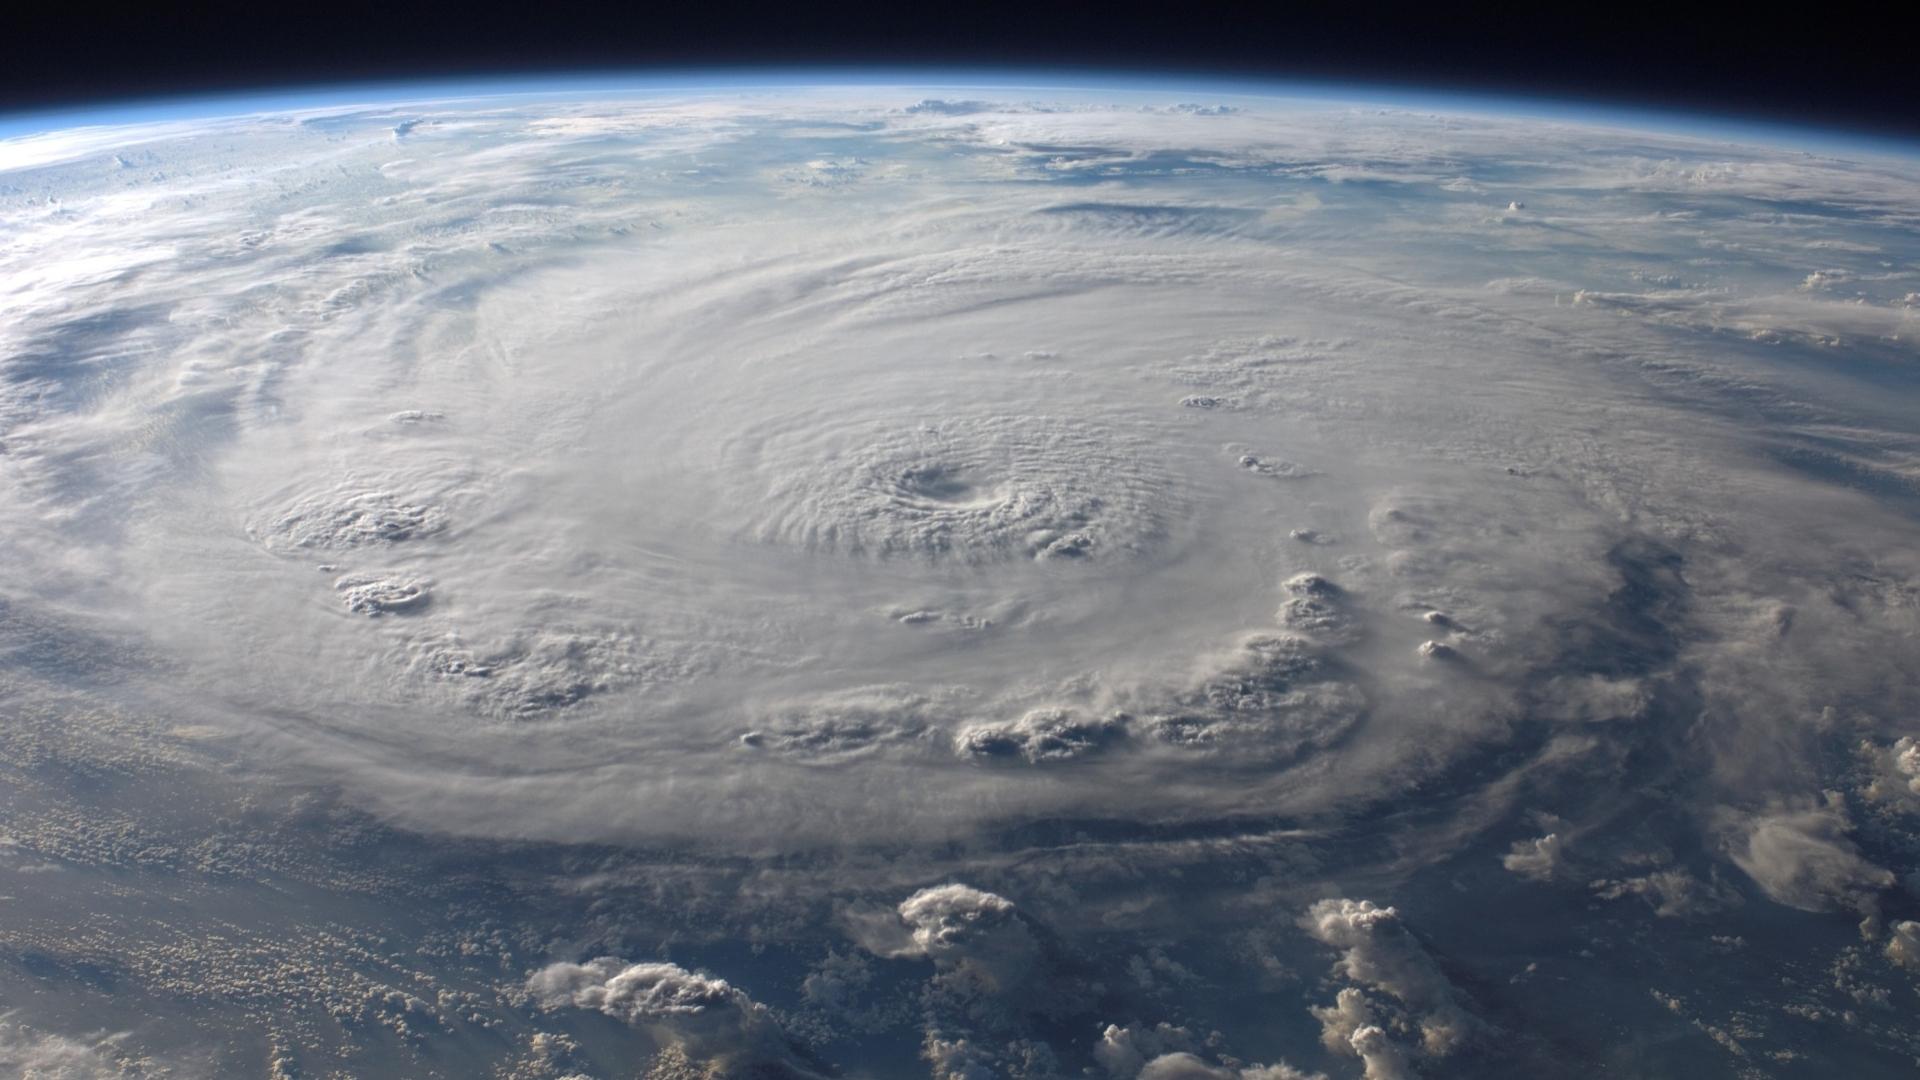 Hurricane Wallpaper Images